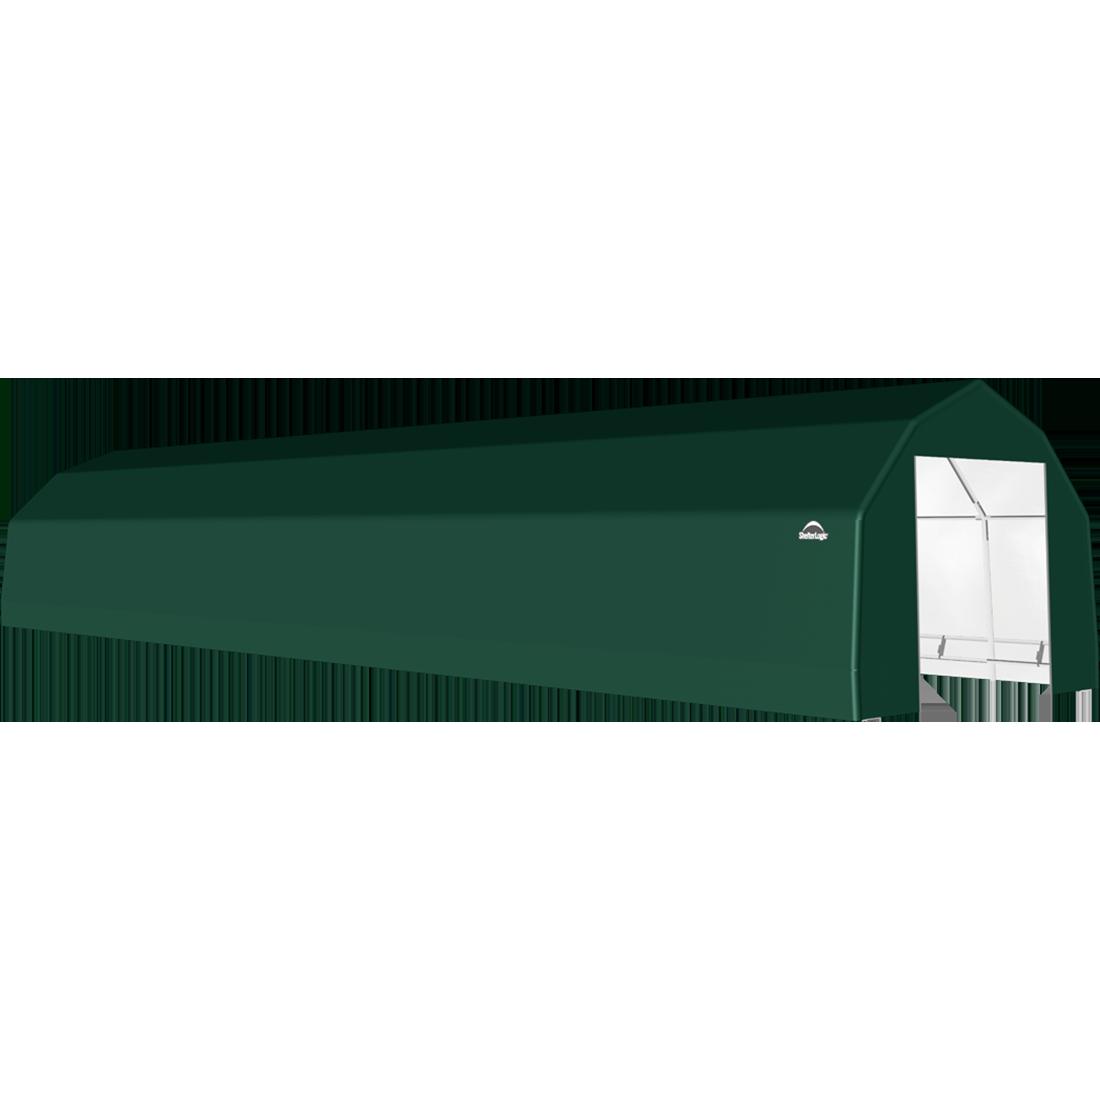 ShelterTech SP Series Barn Shelter, 15 ft. x 64 ft. x 11 ft. Heavy Duty PVC 14.5 oz. Green